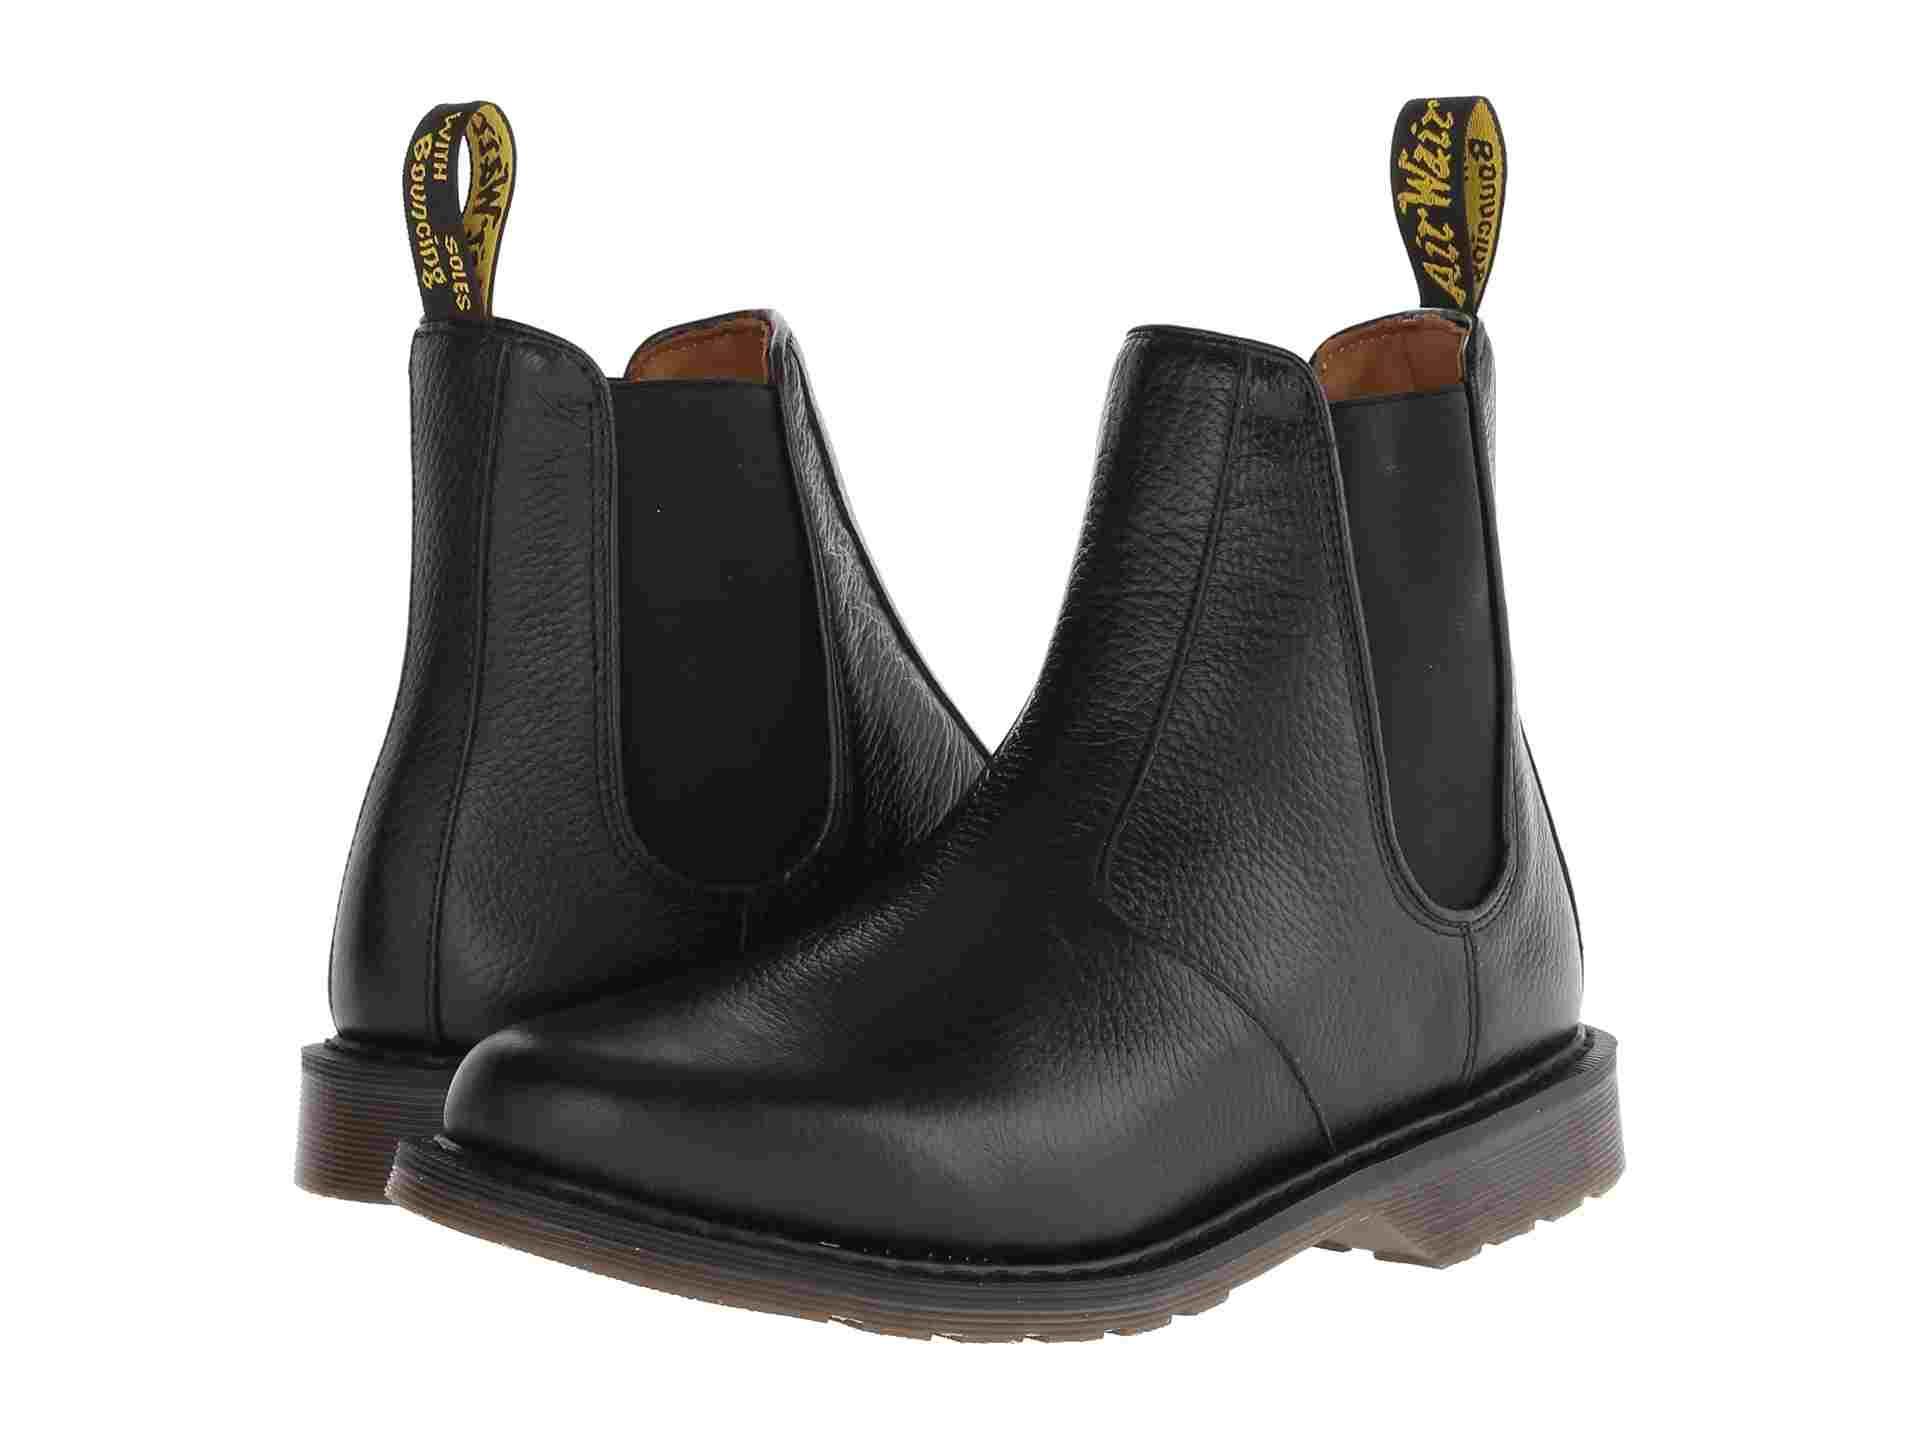 Dr Martens Original Chelsea Boots